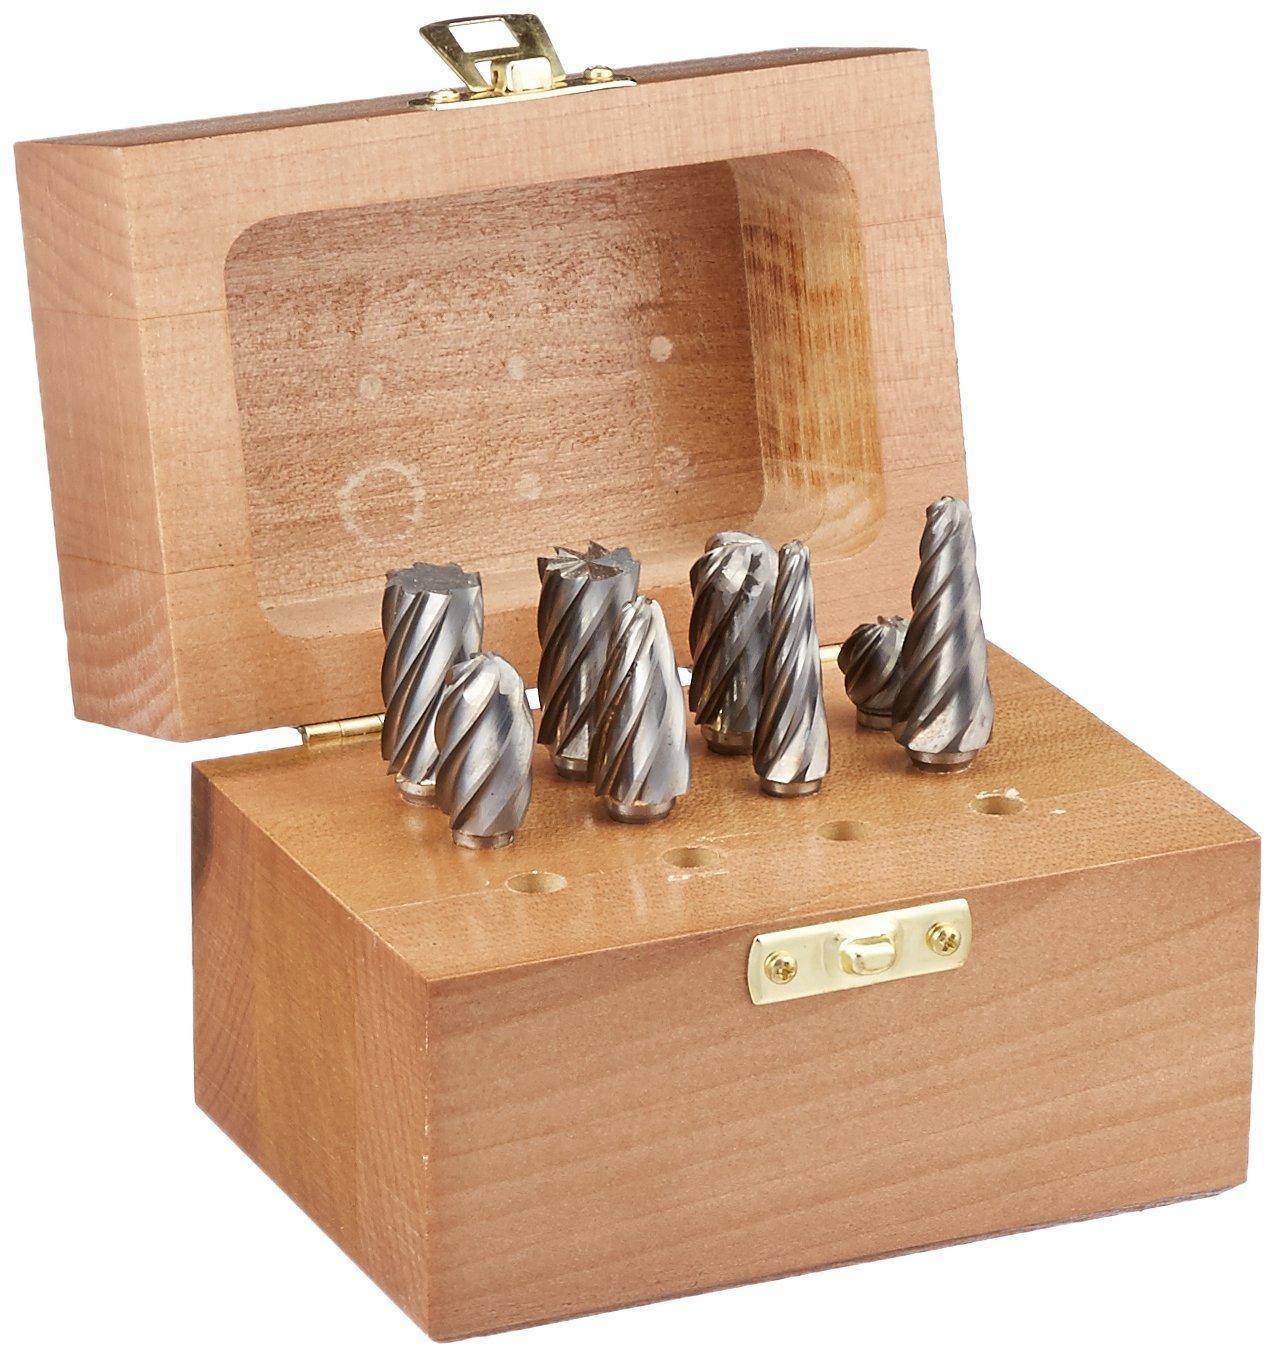 Monster Tool - 310-130005 - Carbide Bur Set, Aluma Cut, 8 piece by Monster Tool